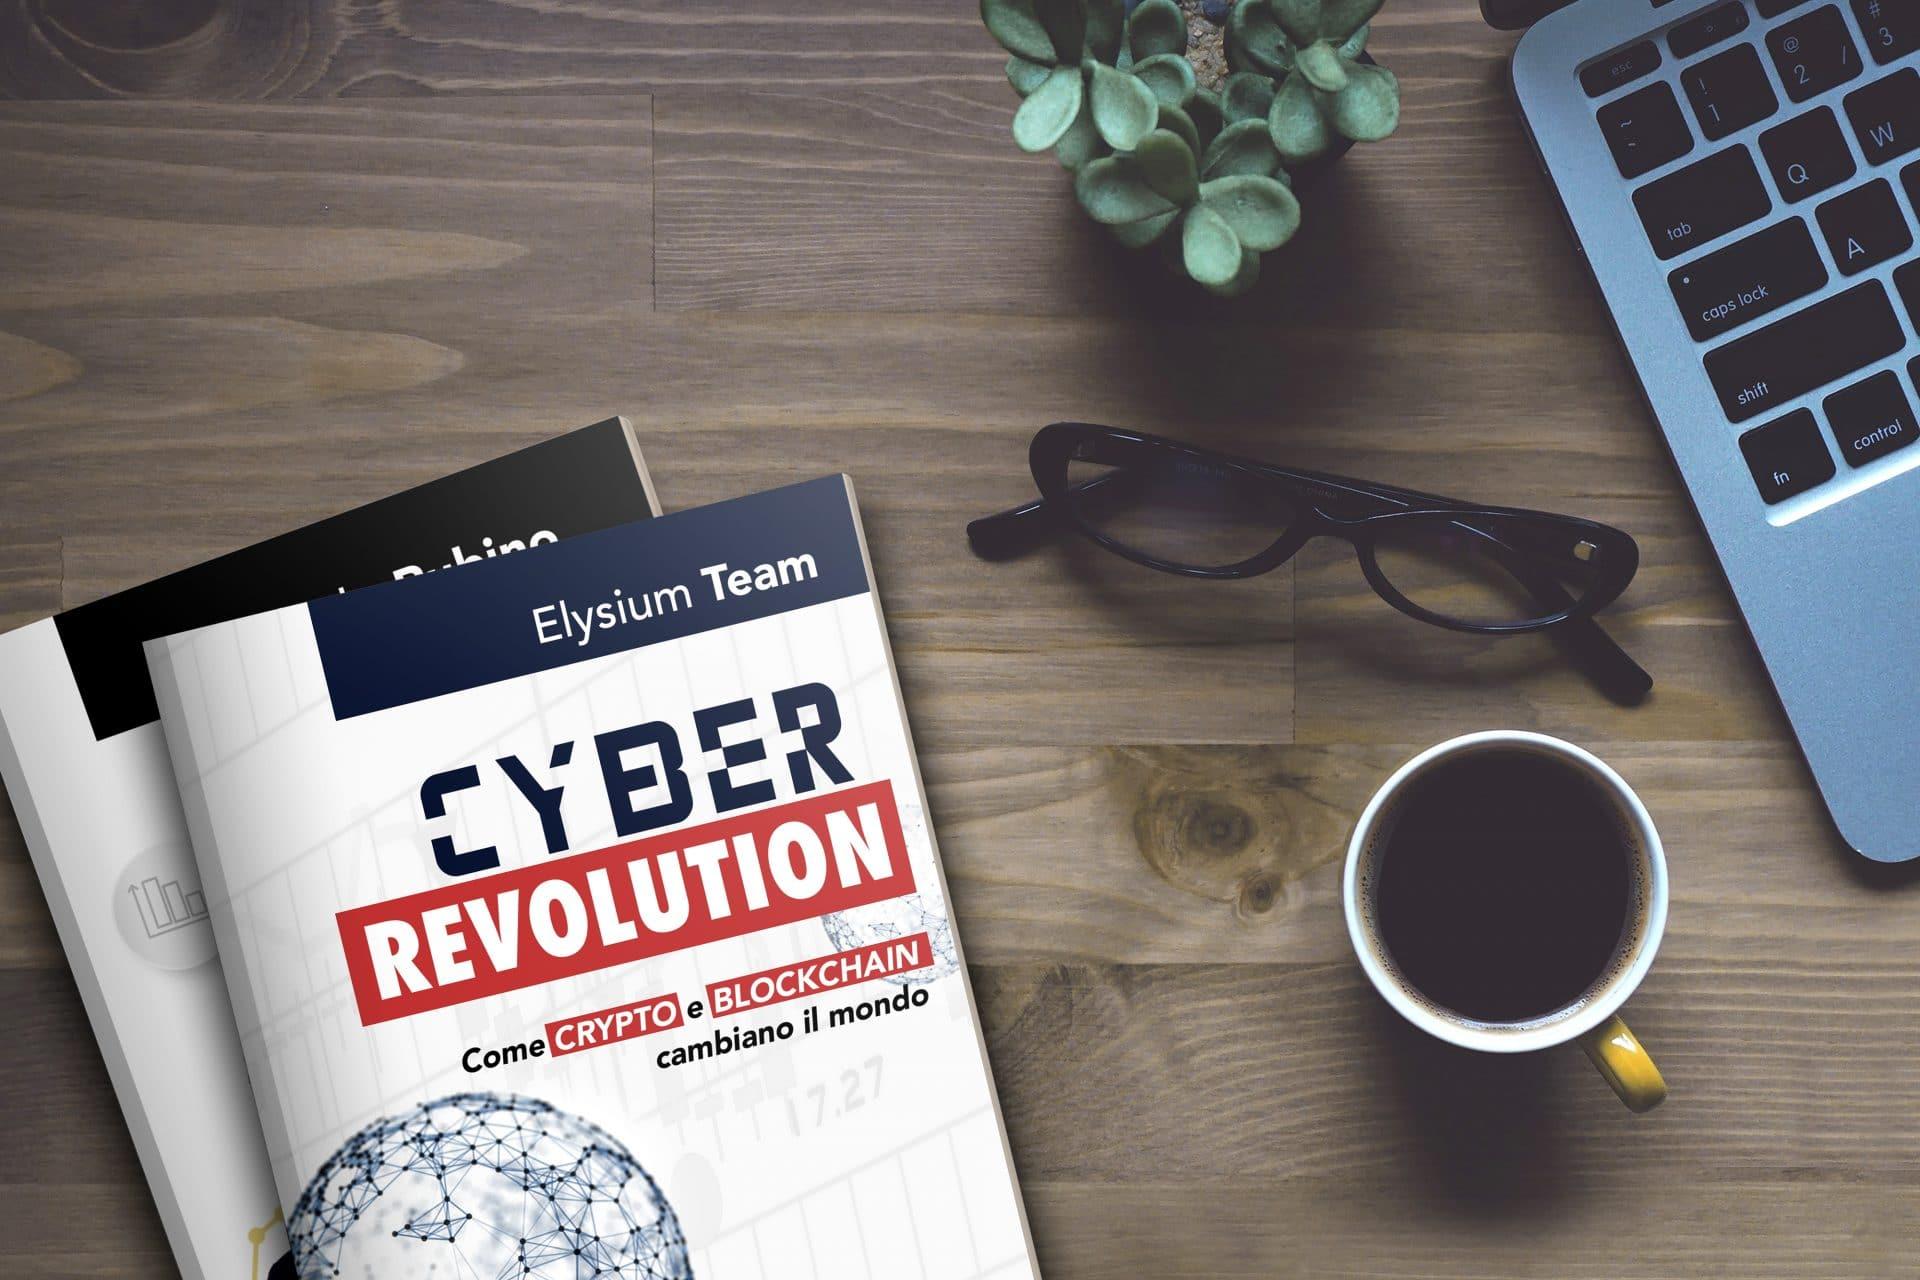 cyberrevolution